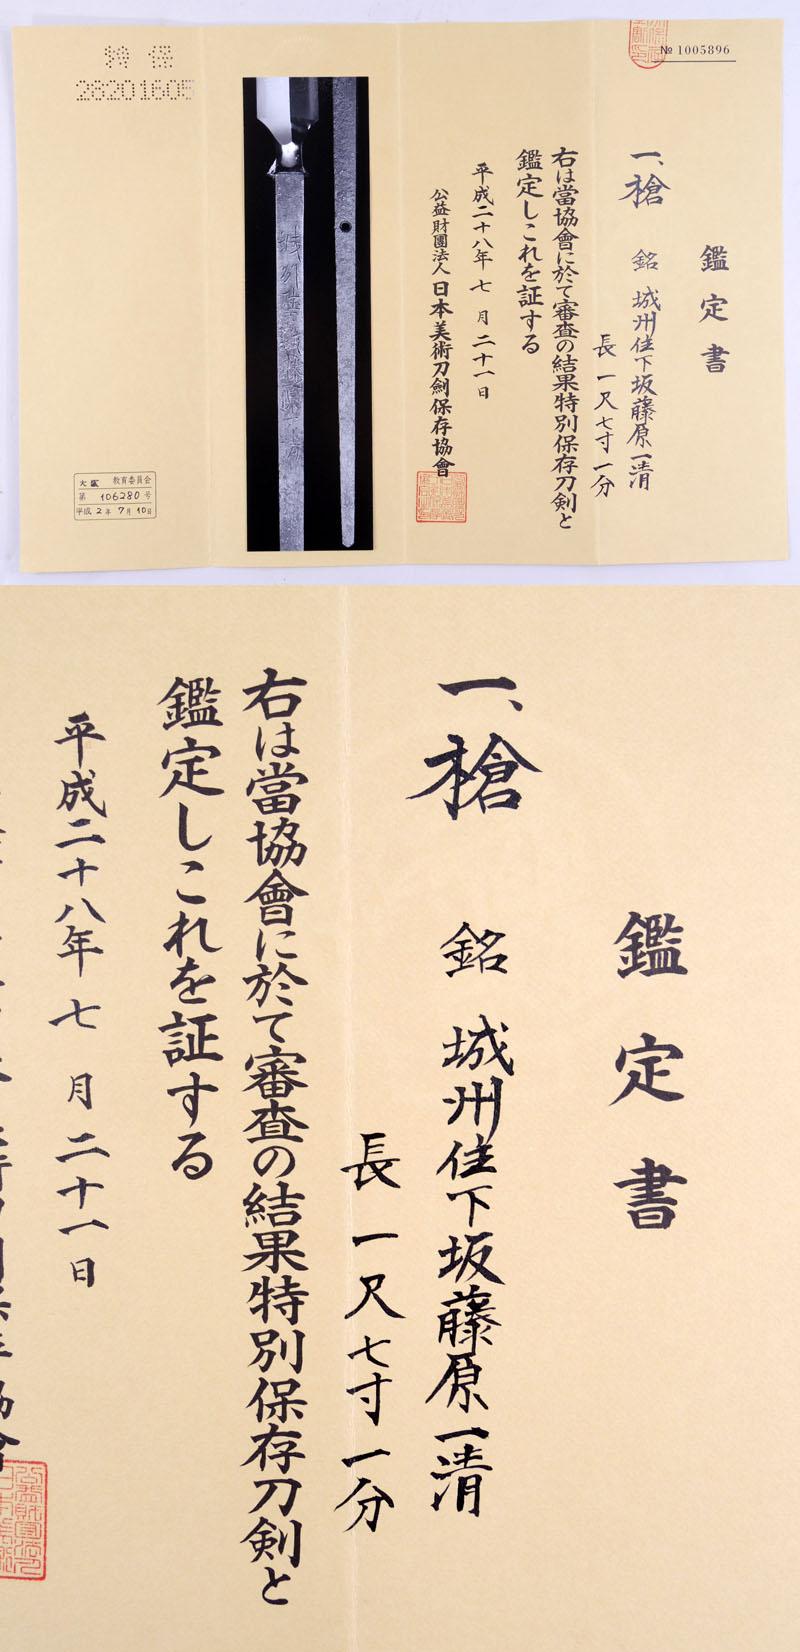 城州住下坂藤原一清 Picture of Certificate